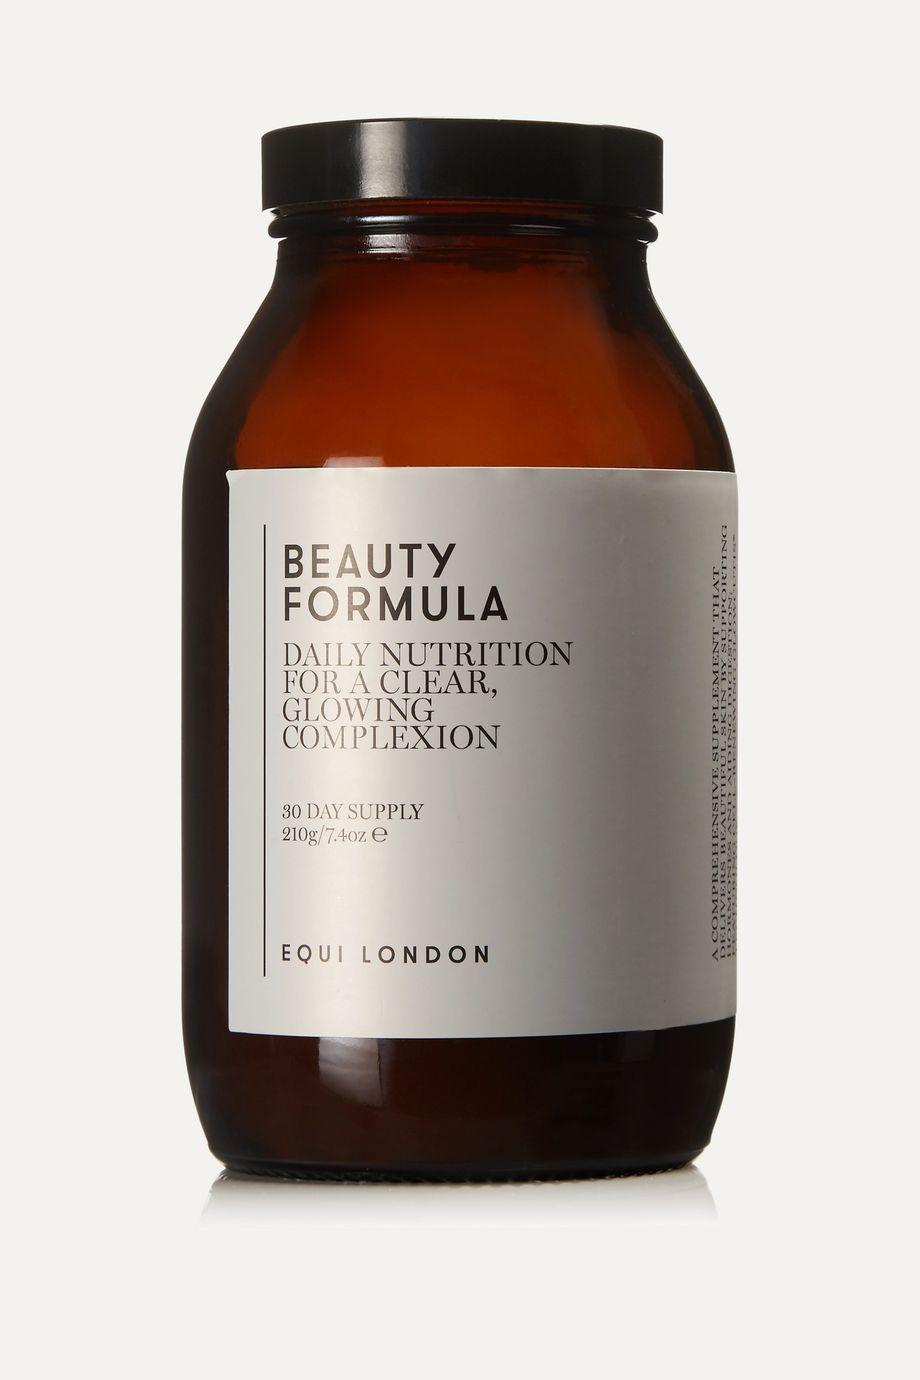 Equi London Beauty Formula, 210g